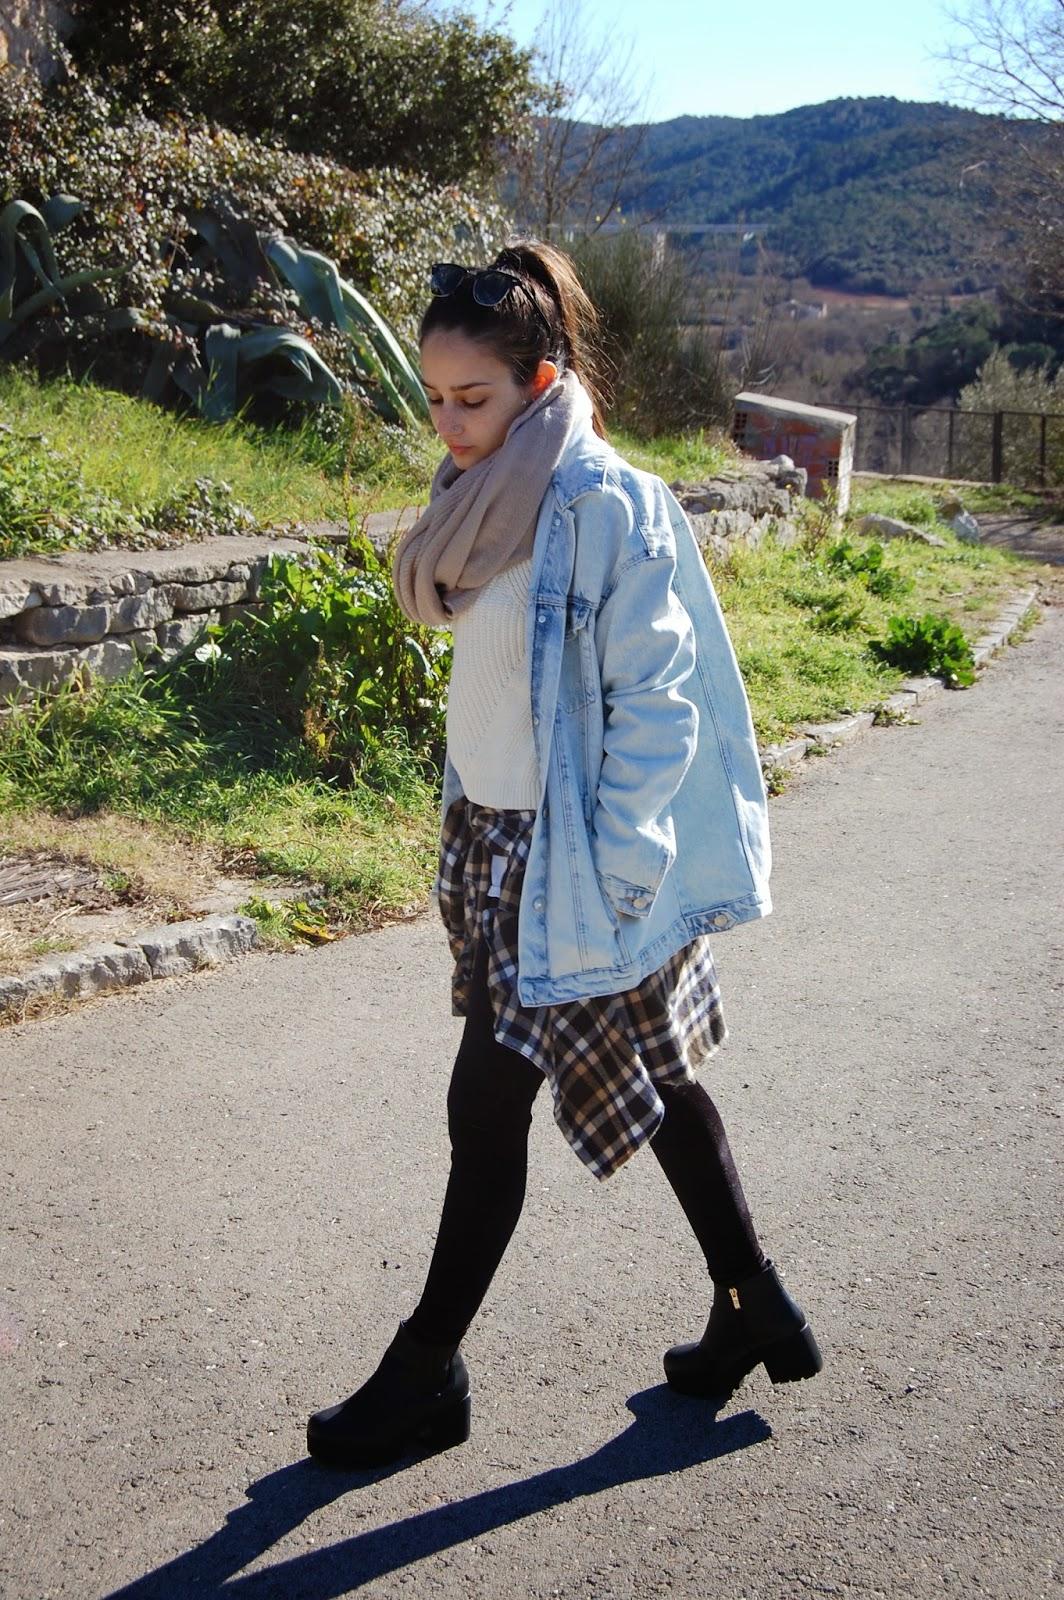 bufanda zara, gafas de sol ray-ban, jersey mango, camisa zara, pantalones calzedonia, zapatos sbt, bolso bimba&lola, reloj michael kors